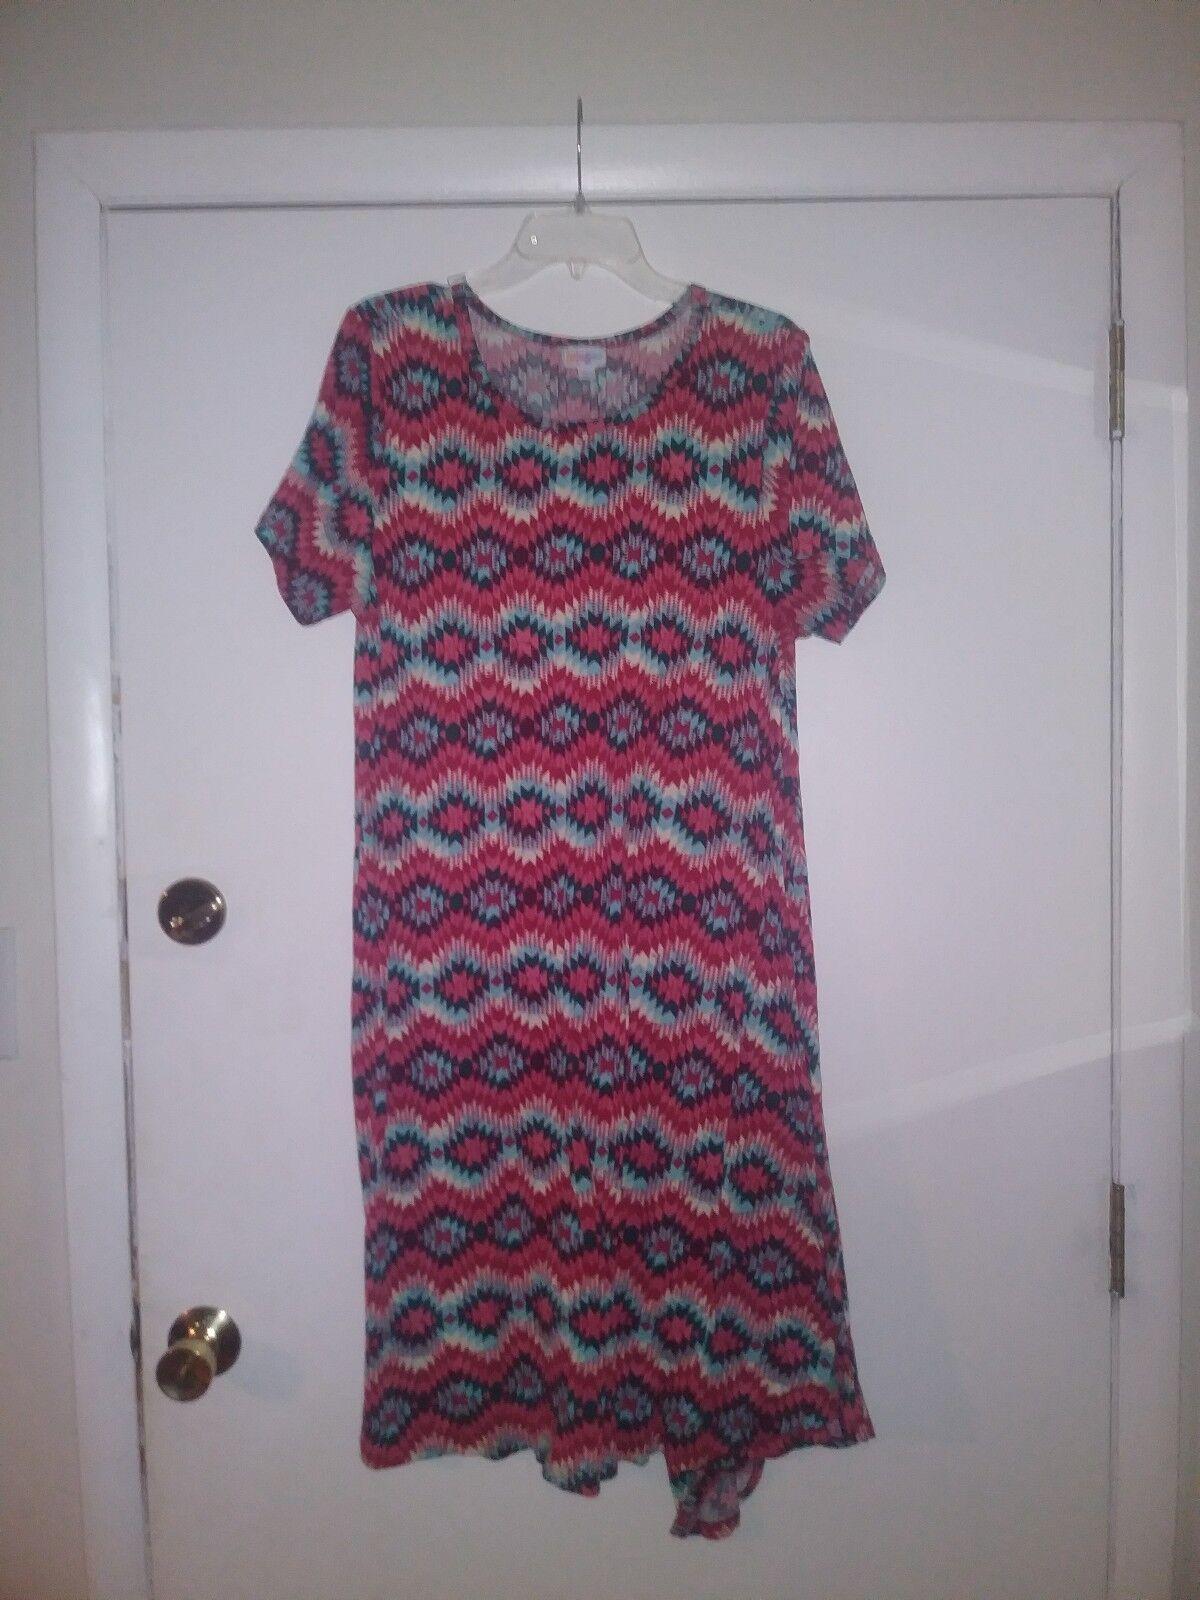 LOT  4 Soft Flattering Plus-Größe Dresses - Lularoe - Carly - Amelia - XL 2XL EUC